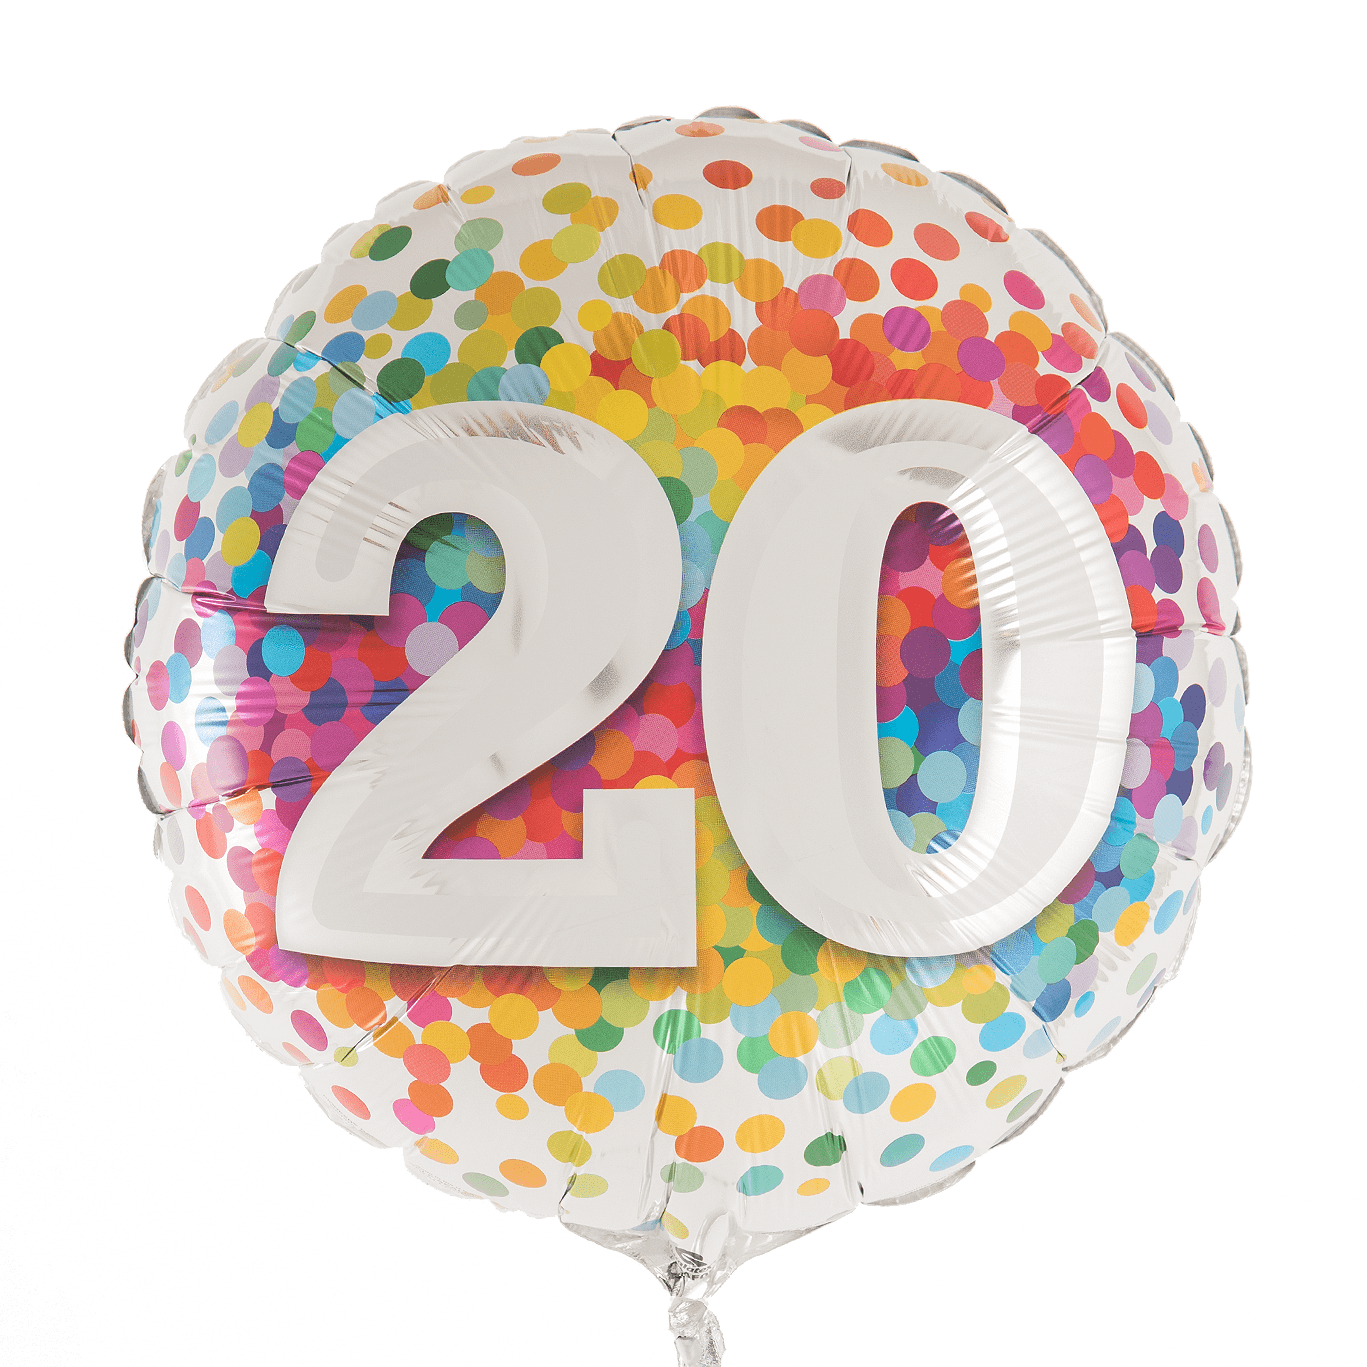 20 year Ballons